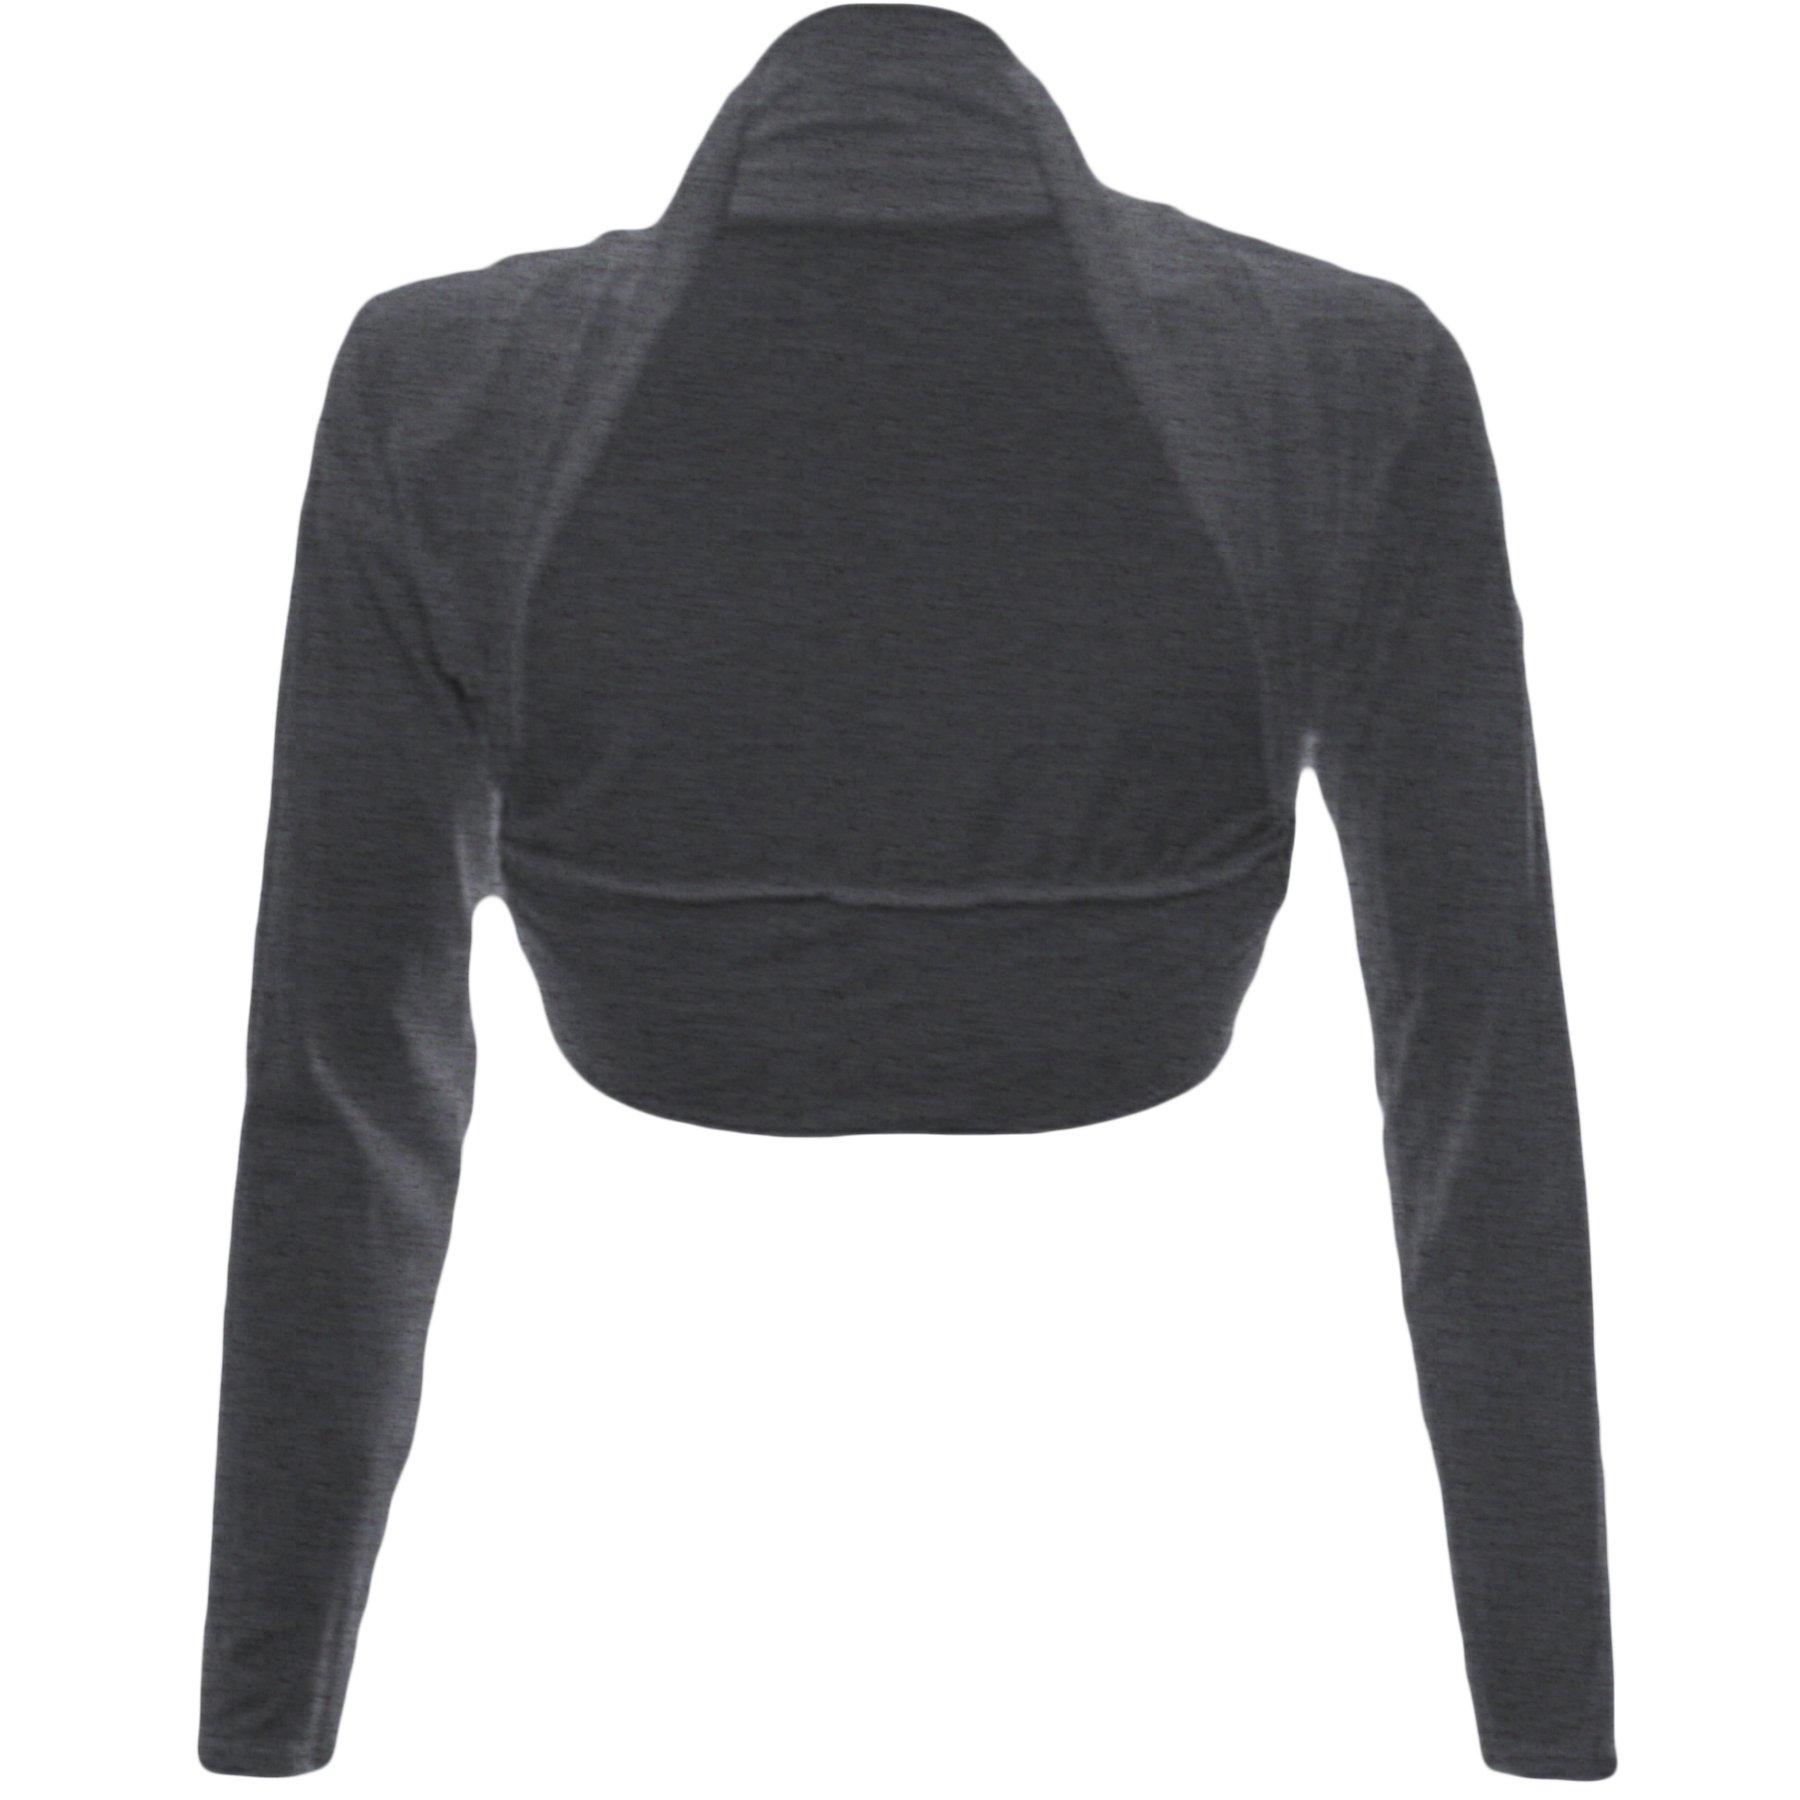 Fashion Wardrobe Womens Long Sleeve Boleros Shrugs Tops Ladies Casual Crop Cardigan Bolero Top ♥ (USA 6-8/UK 6-10 (S/M), Charcoal)